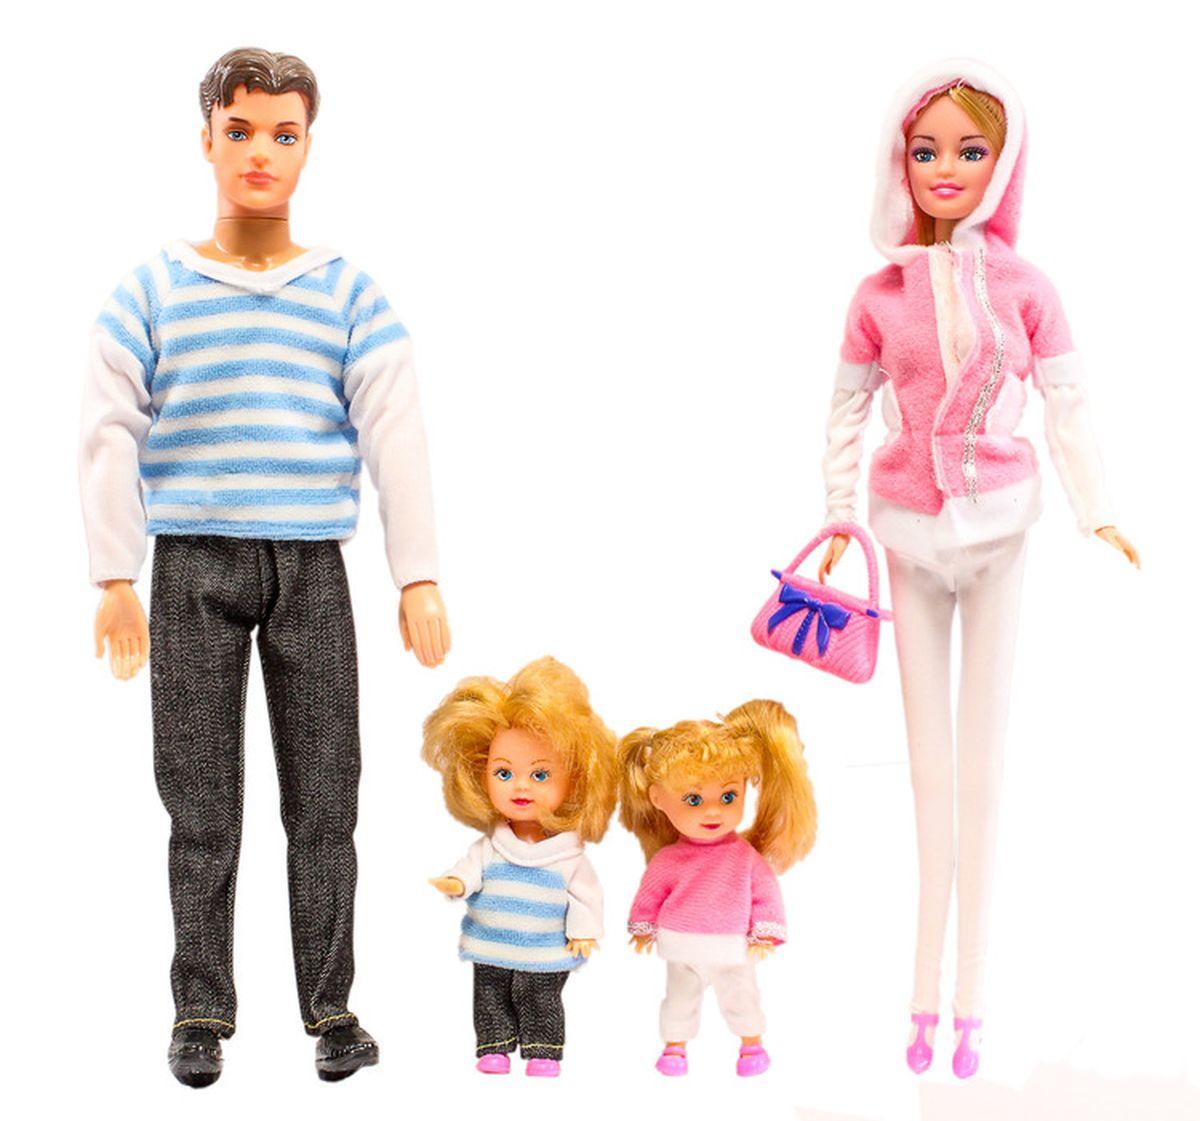 семья кукол картинки